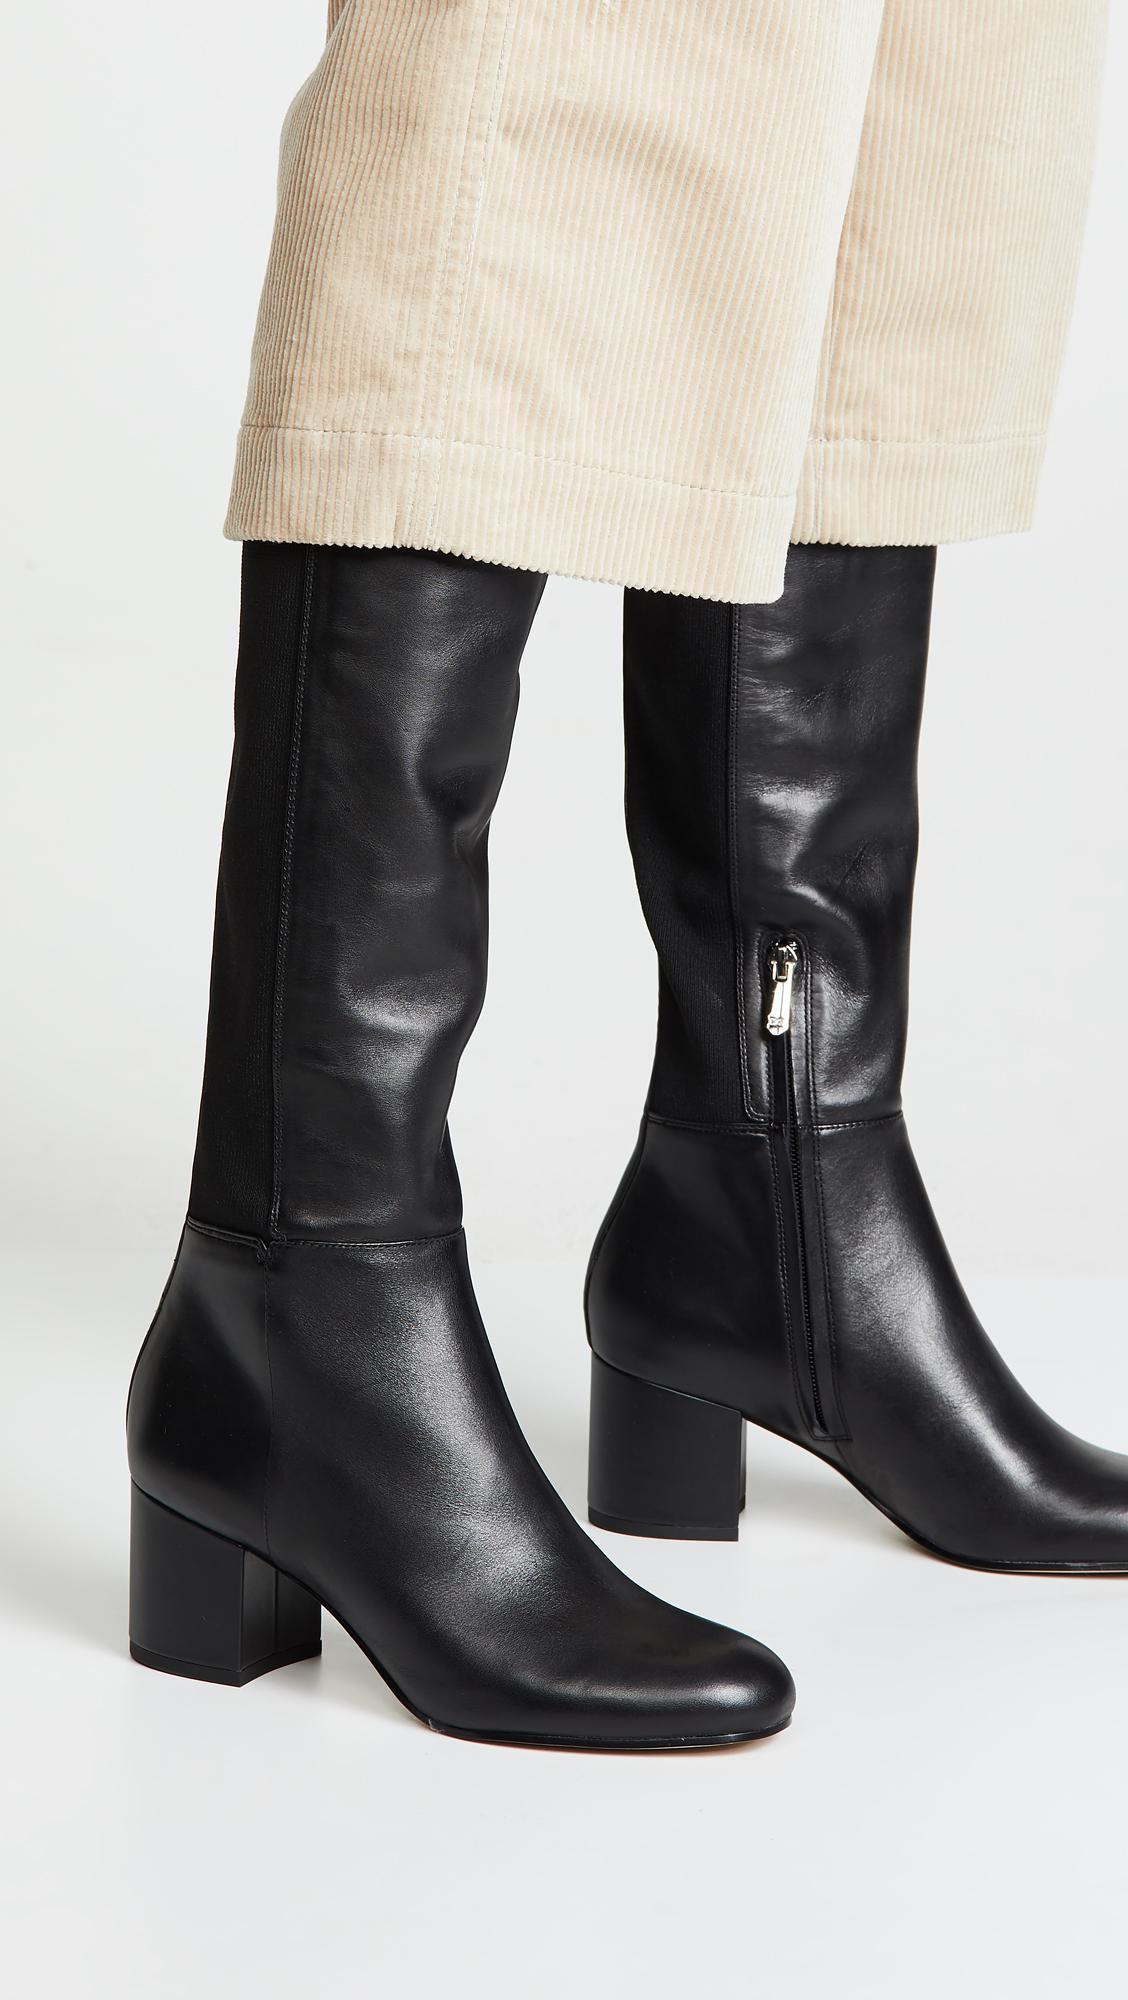 0877beadf84490 Lyst - Sam Edelman Valda Boots in Black